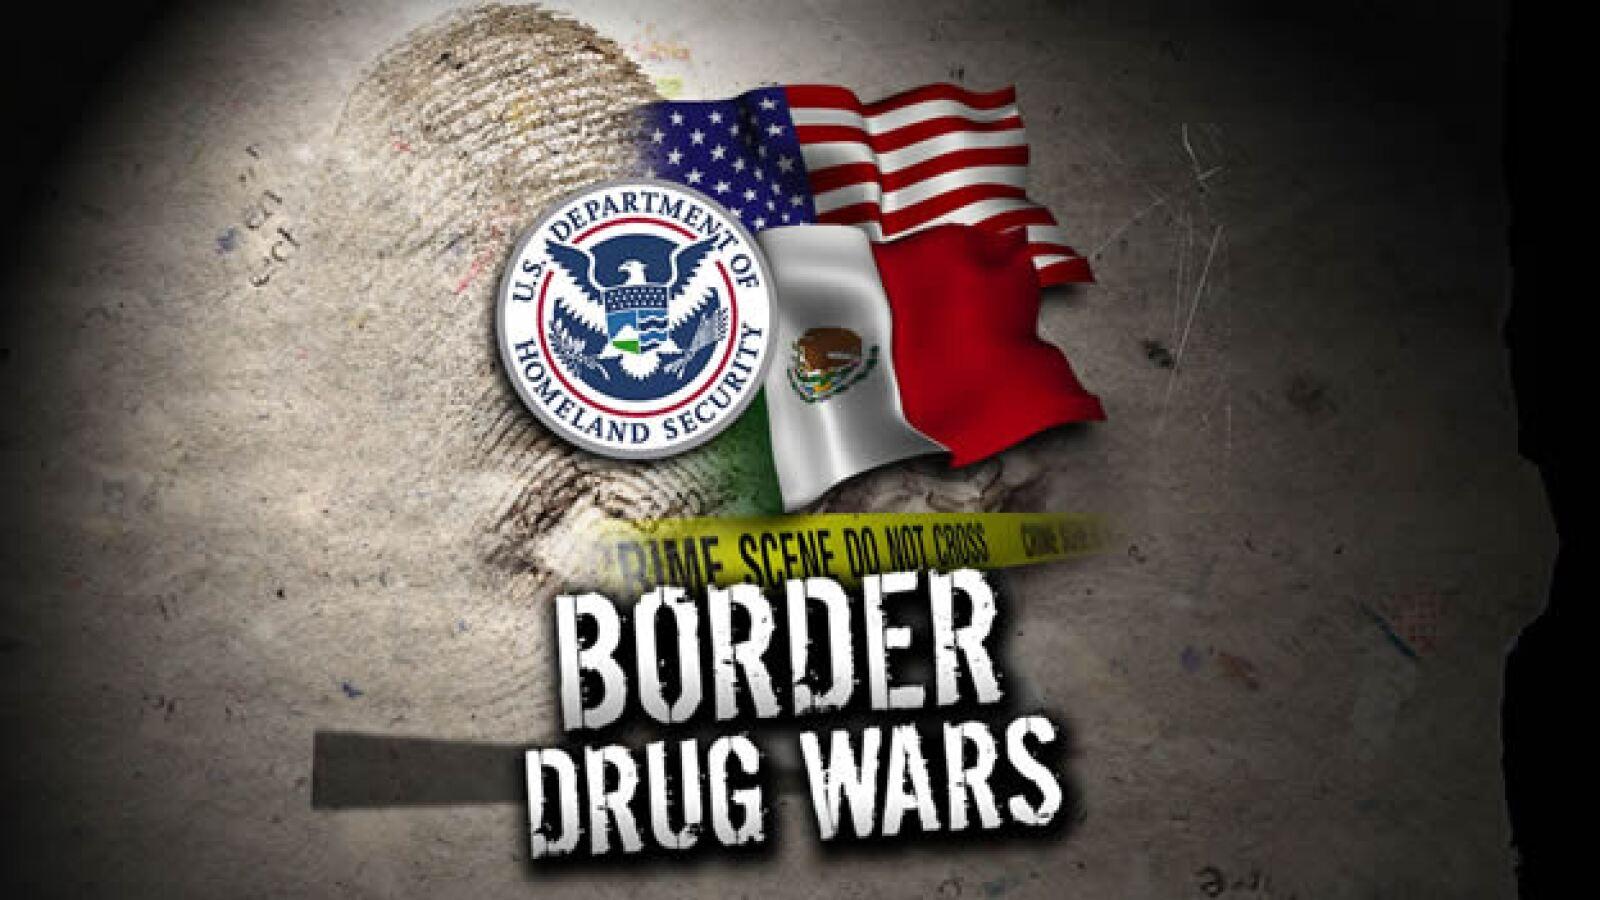 Desde que asumió el poder, Barack Obama se propuso una guerra frontal al narco